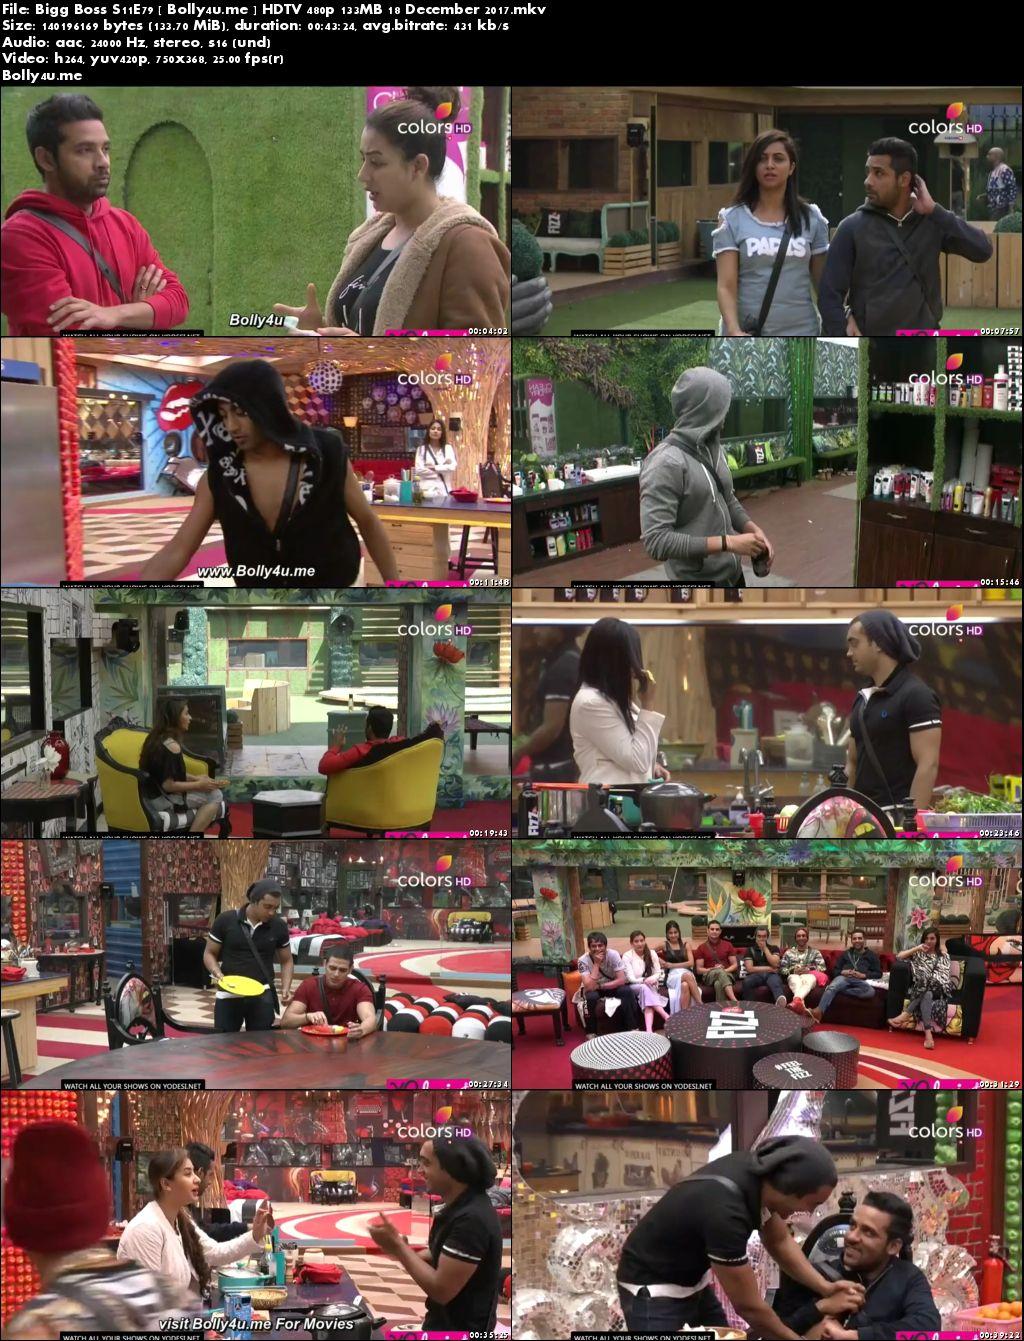 Bigg Boss S11E79 HDTV 480p 130MB 18 December 2017 Download